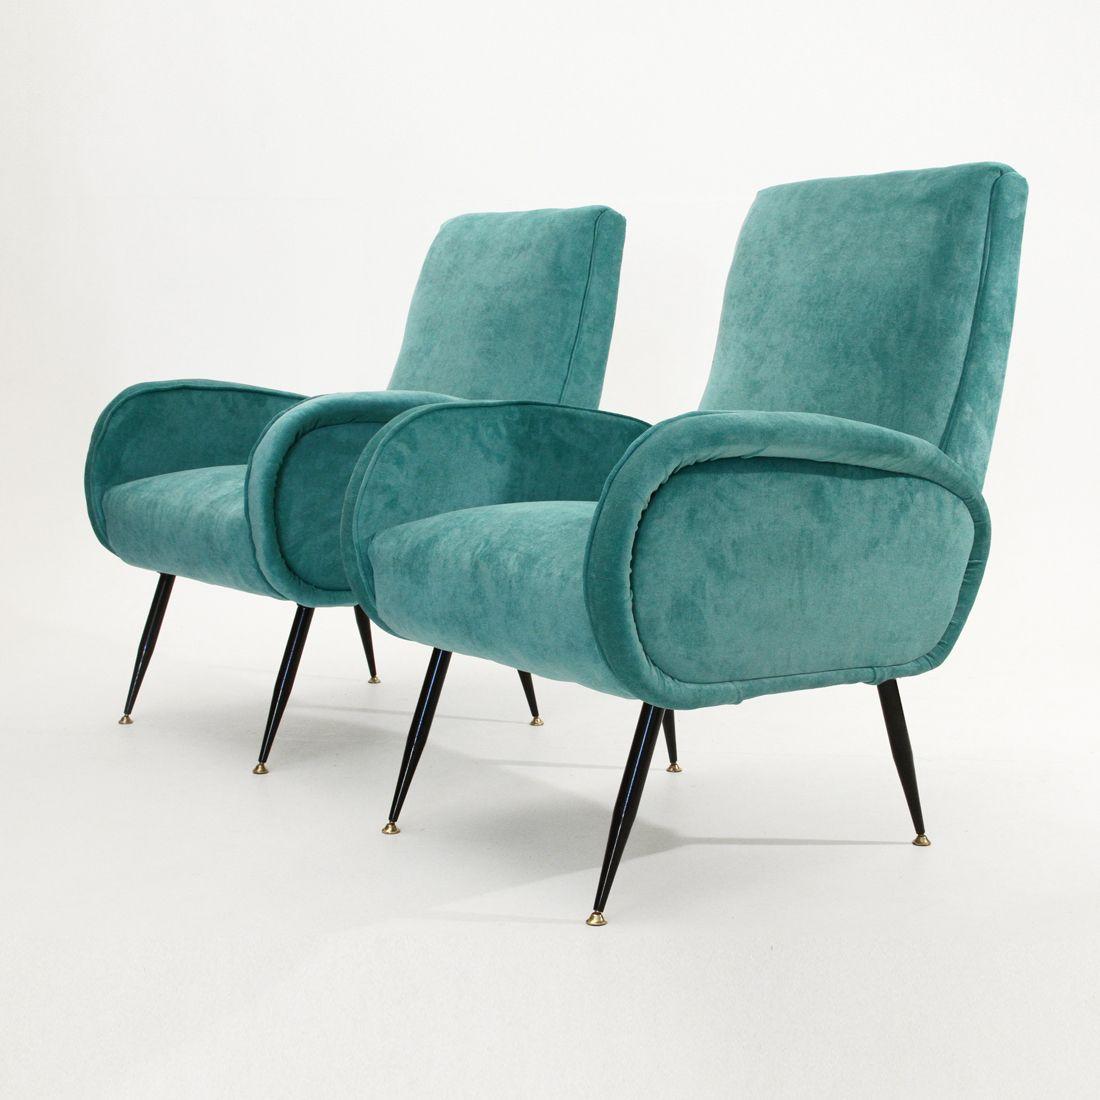 Italian Mid Century Blue Velvet Armchairs 1950s Set Of 2 Arredamento D Interni Arredamento Interni